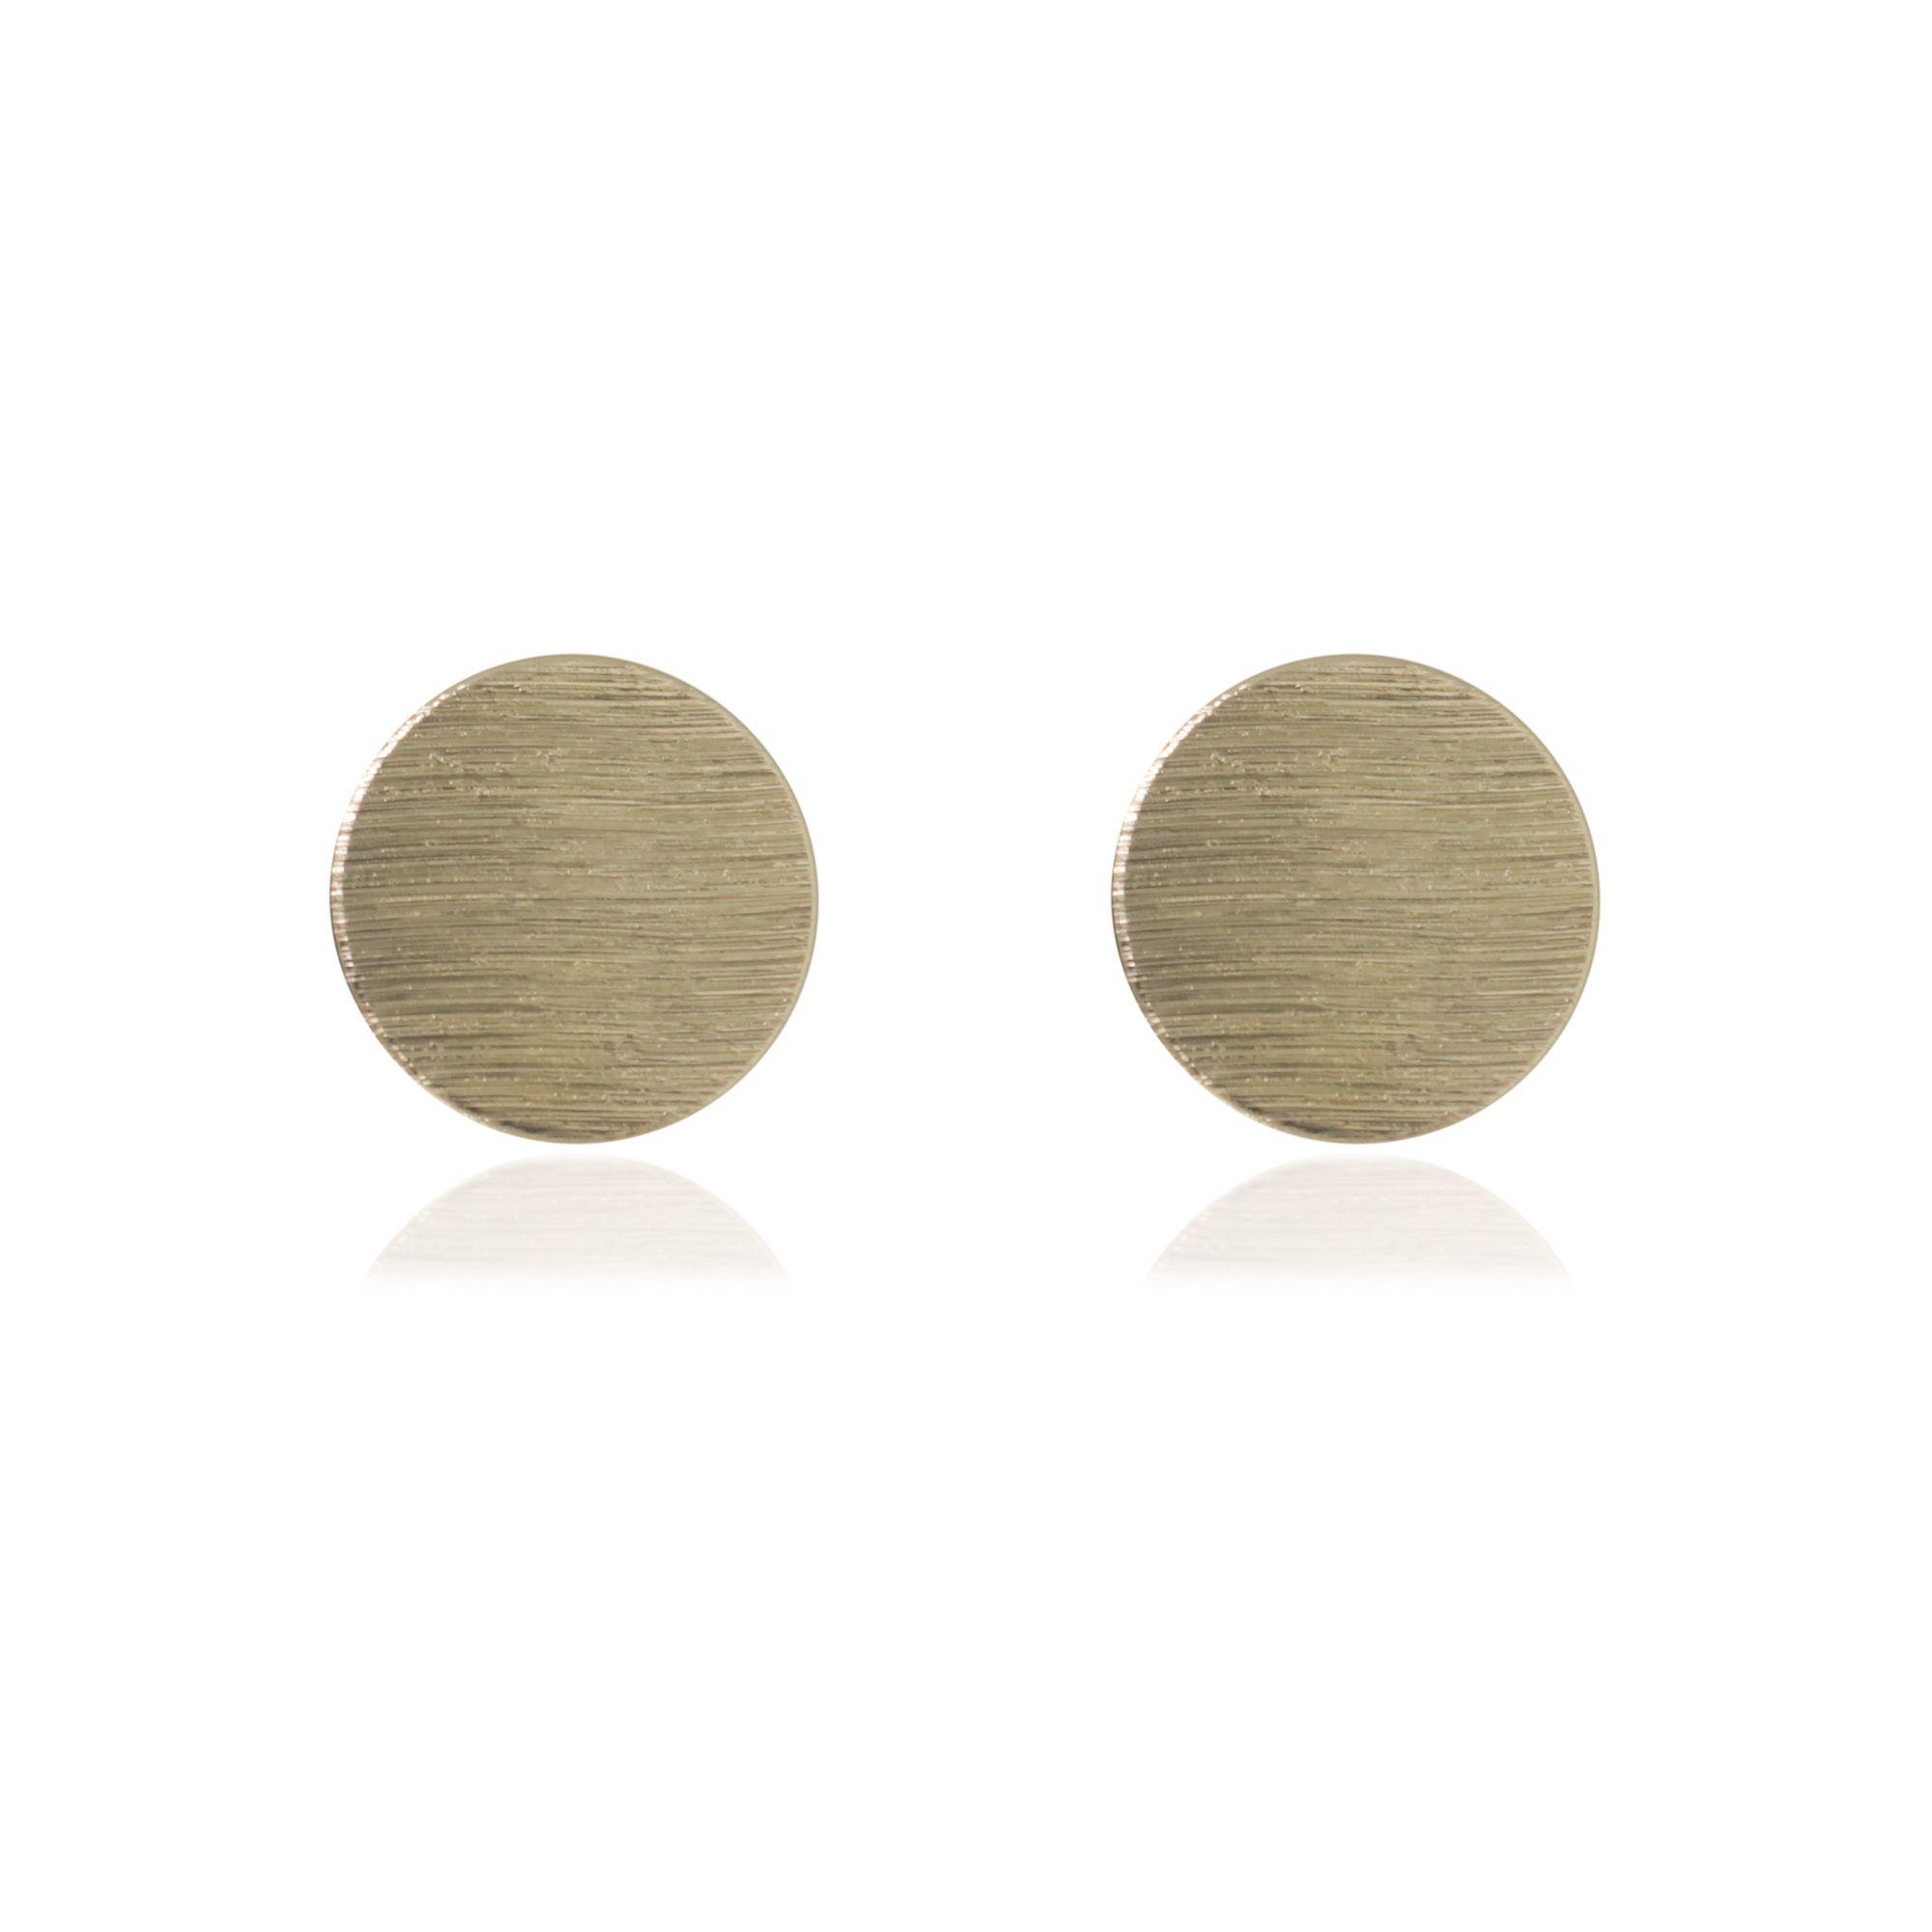 Brinco plaquinha redonda semi joia banhada a ouro 18k ou rhodium